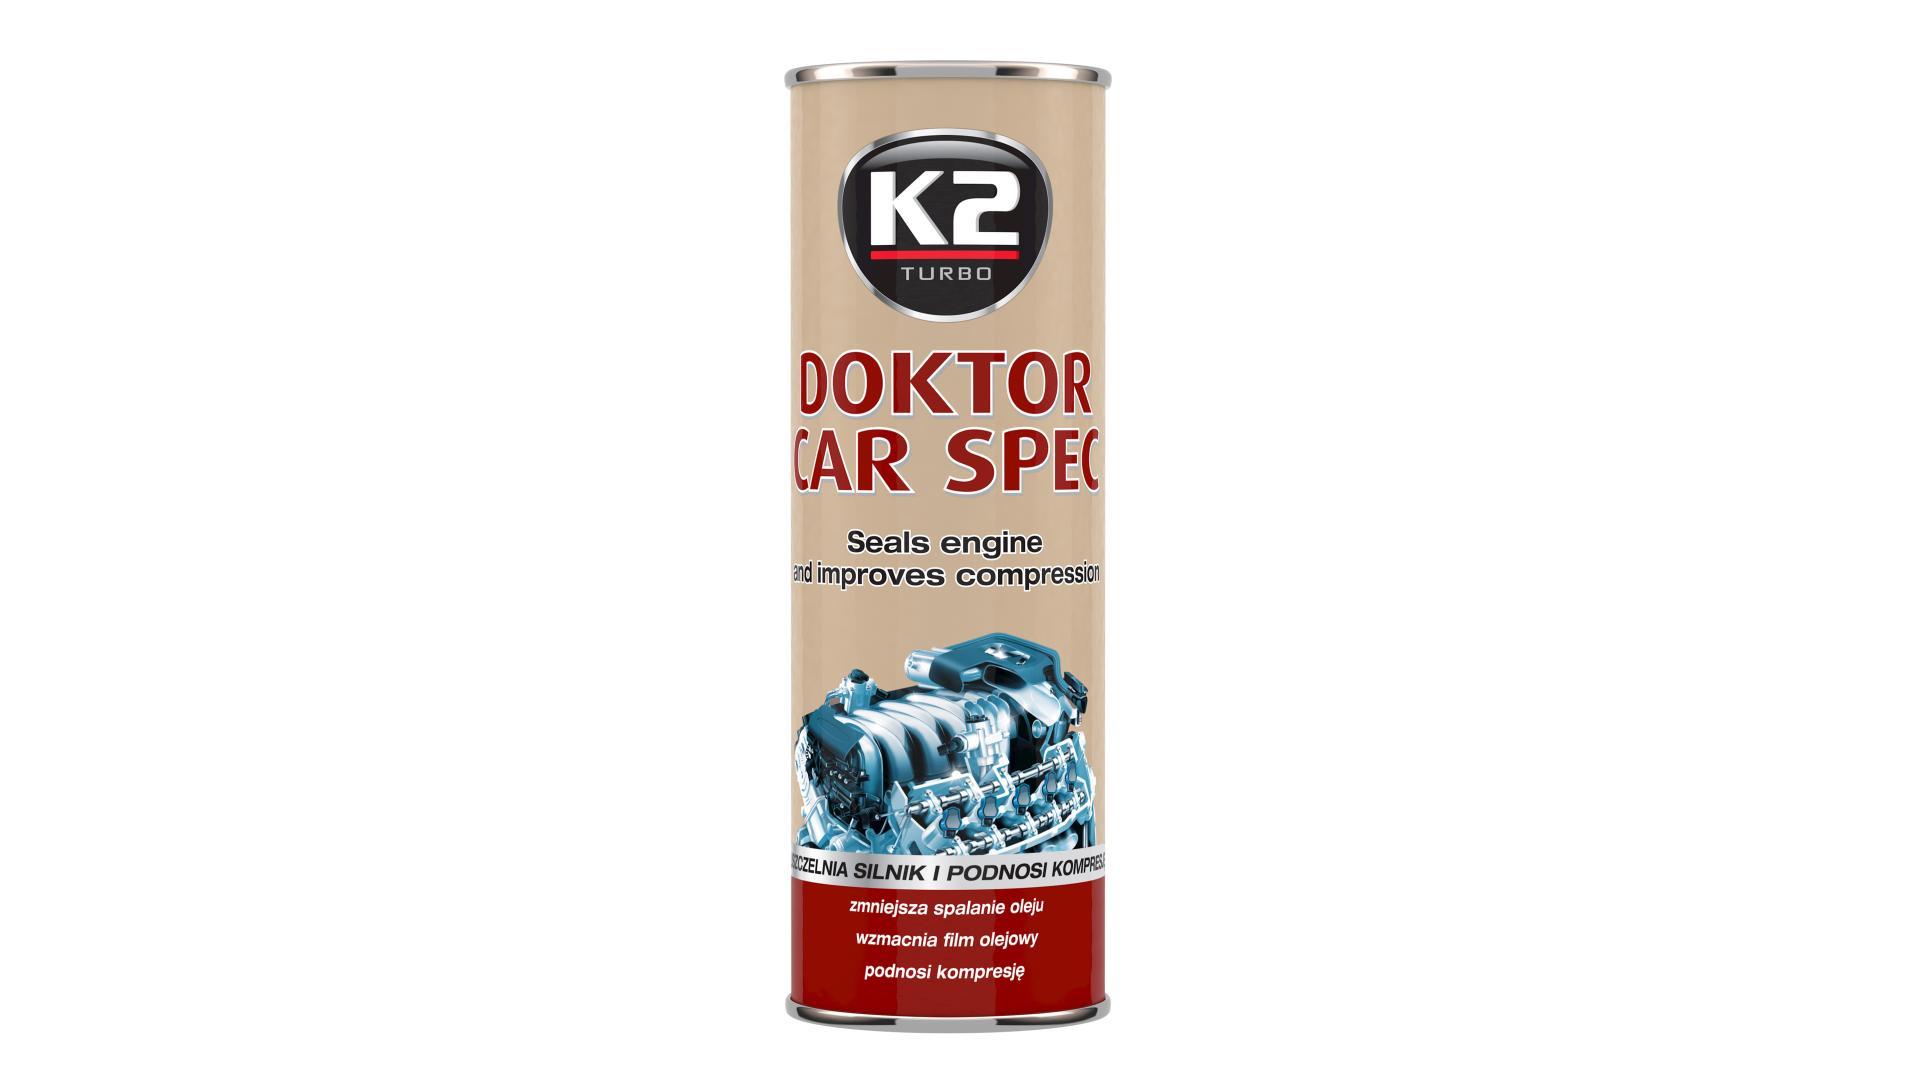 K2 Ošetrenie motora - Doktor Car Spec 443ml